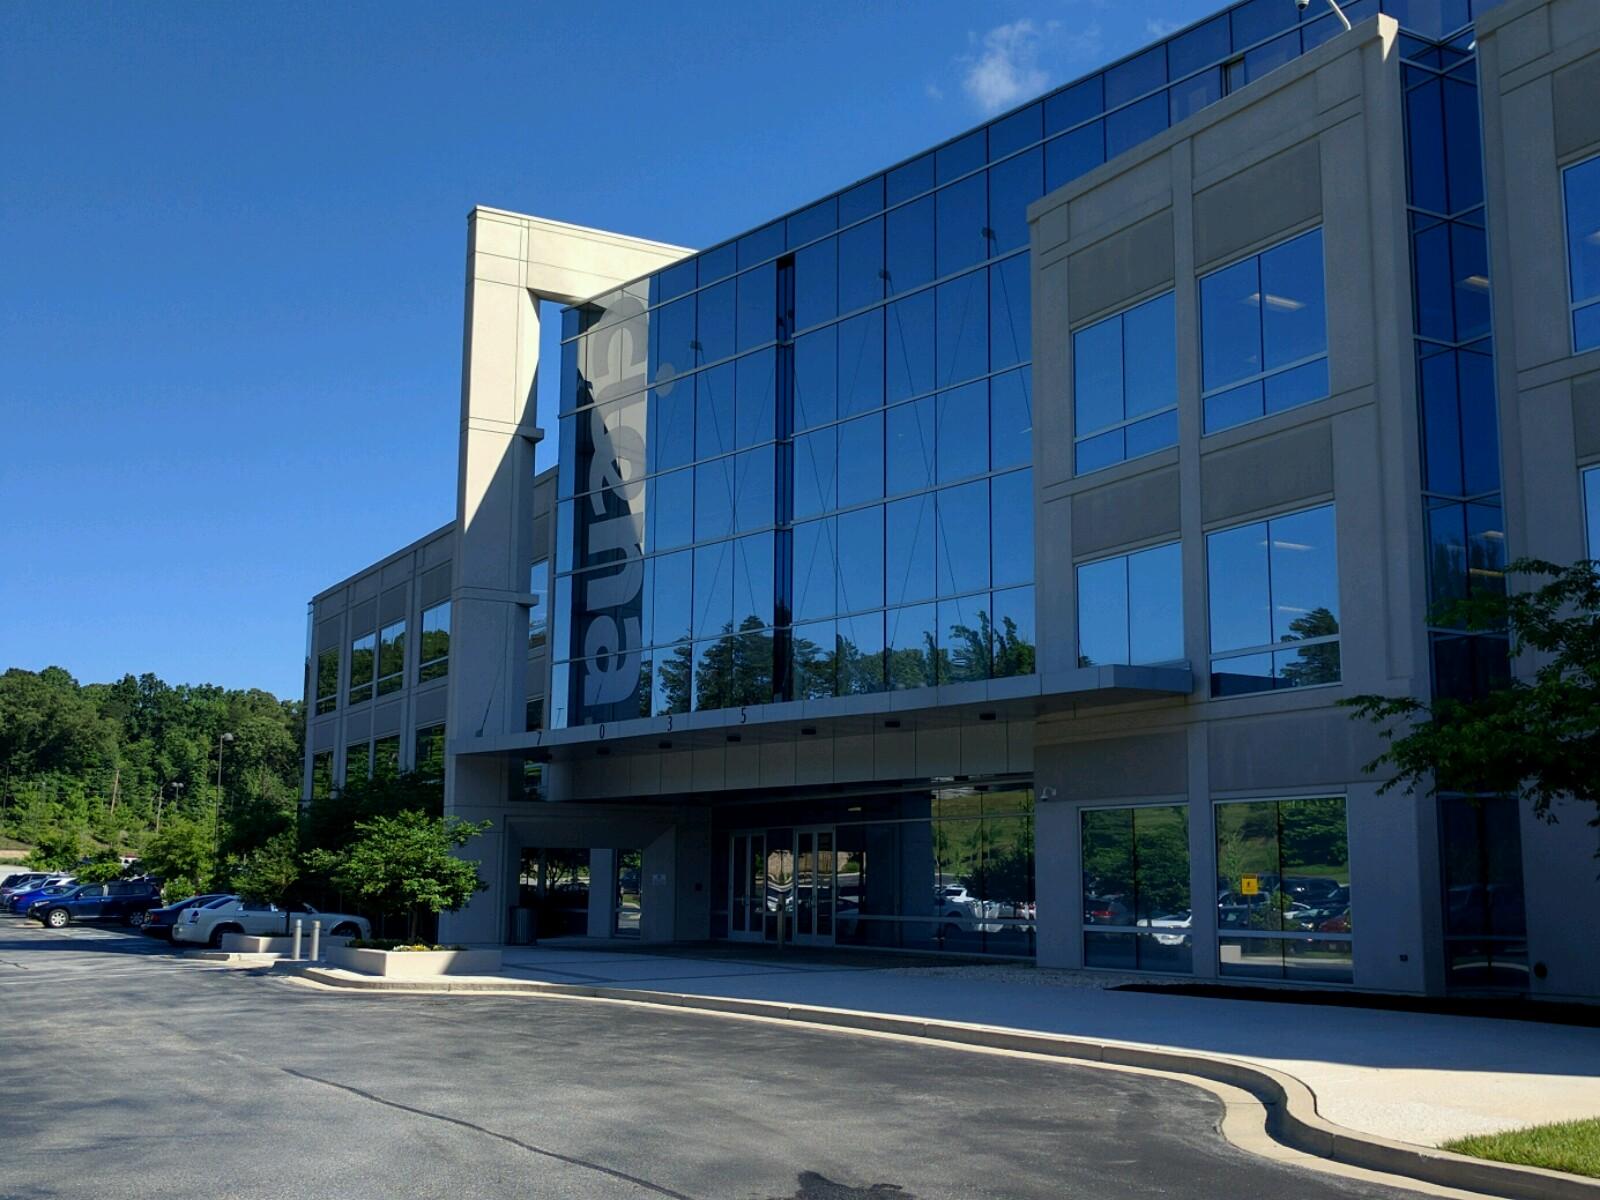 Ciena's corporate headquarters in Hanover, Maryland.